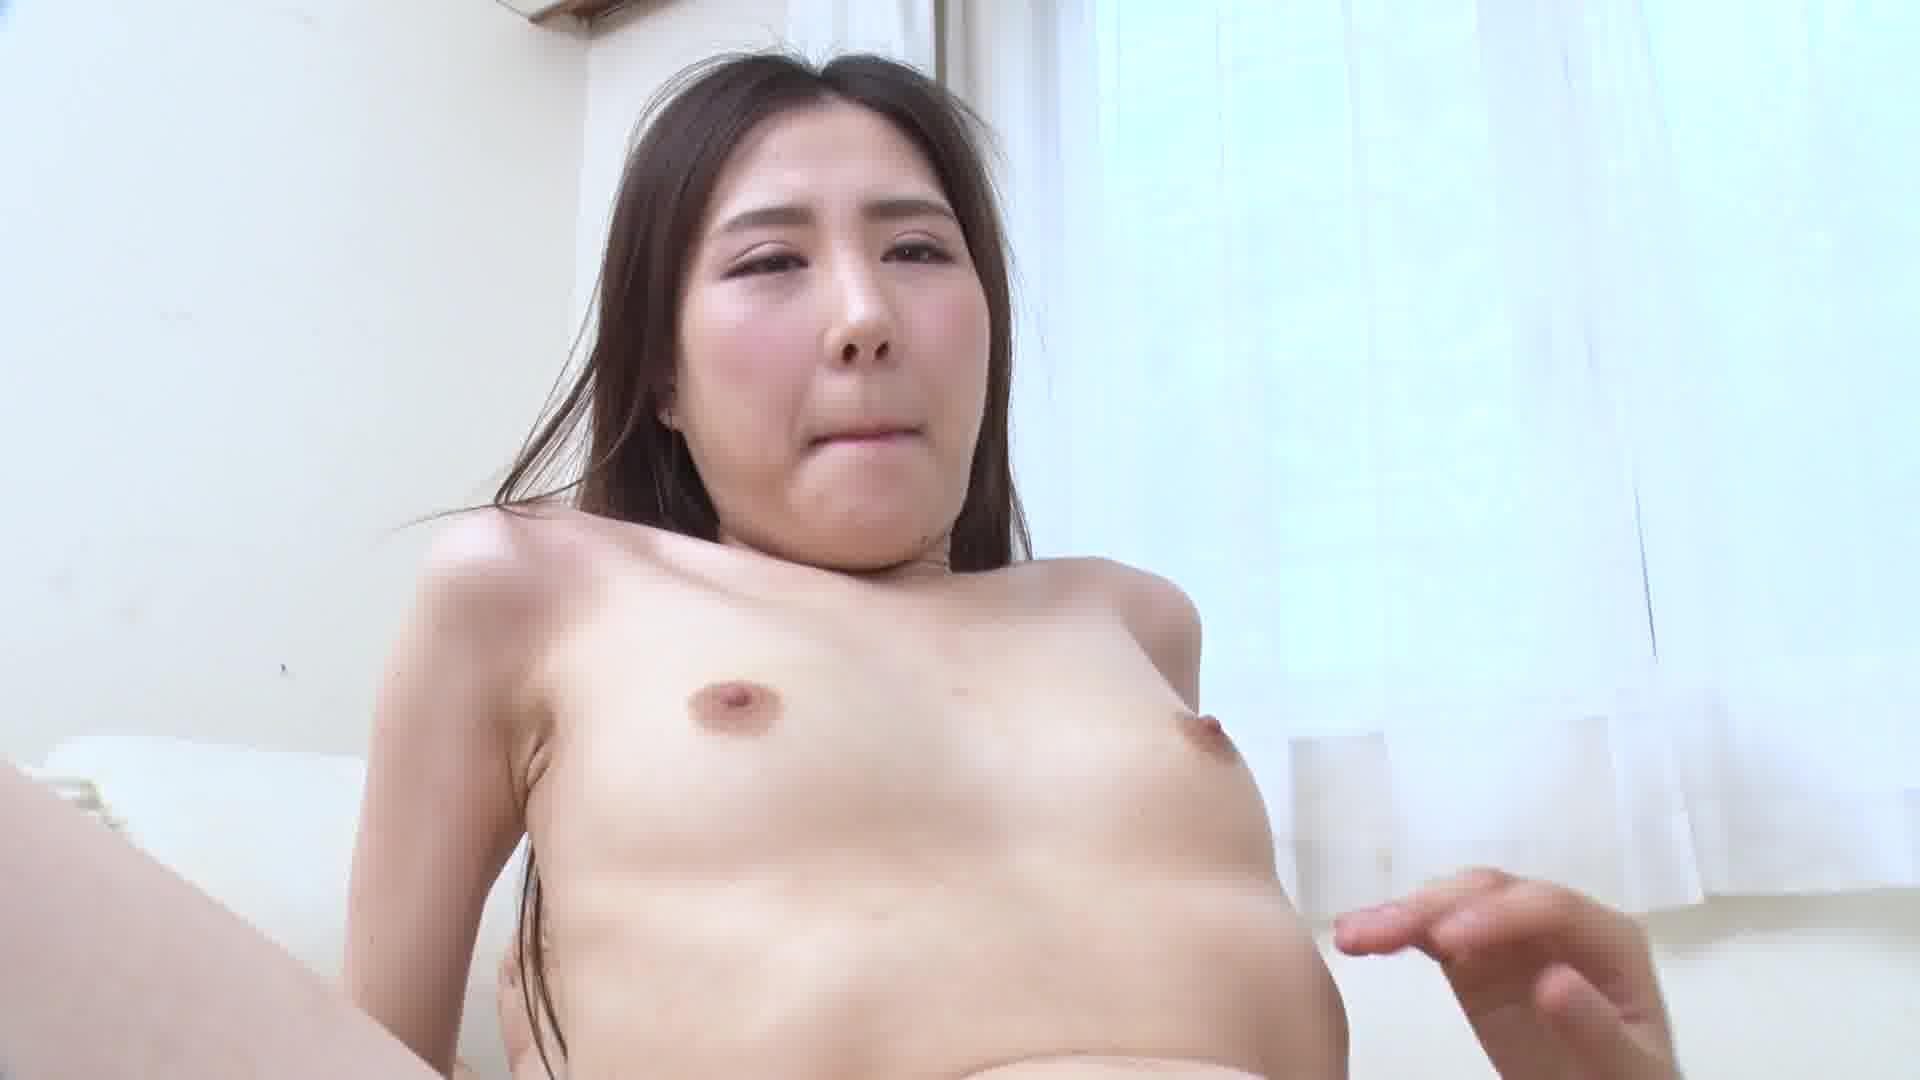 BOGA x BOGA ~櫻井えみが僕のプレイを褒め称えてくれる~ - 櫻井えみ【美乳・スレンダー・中出し】